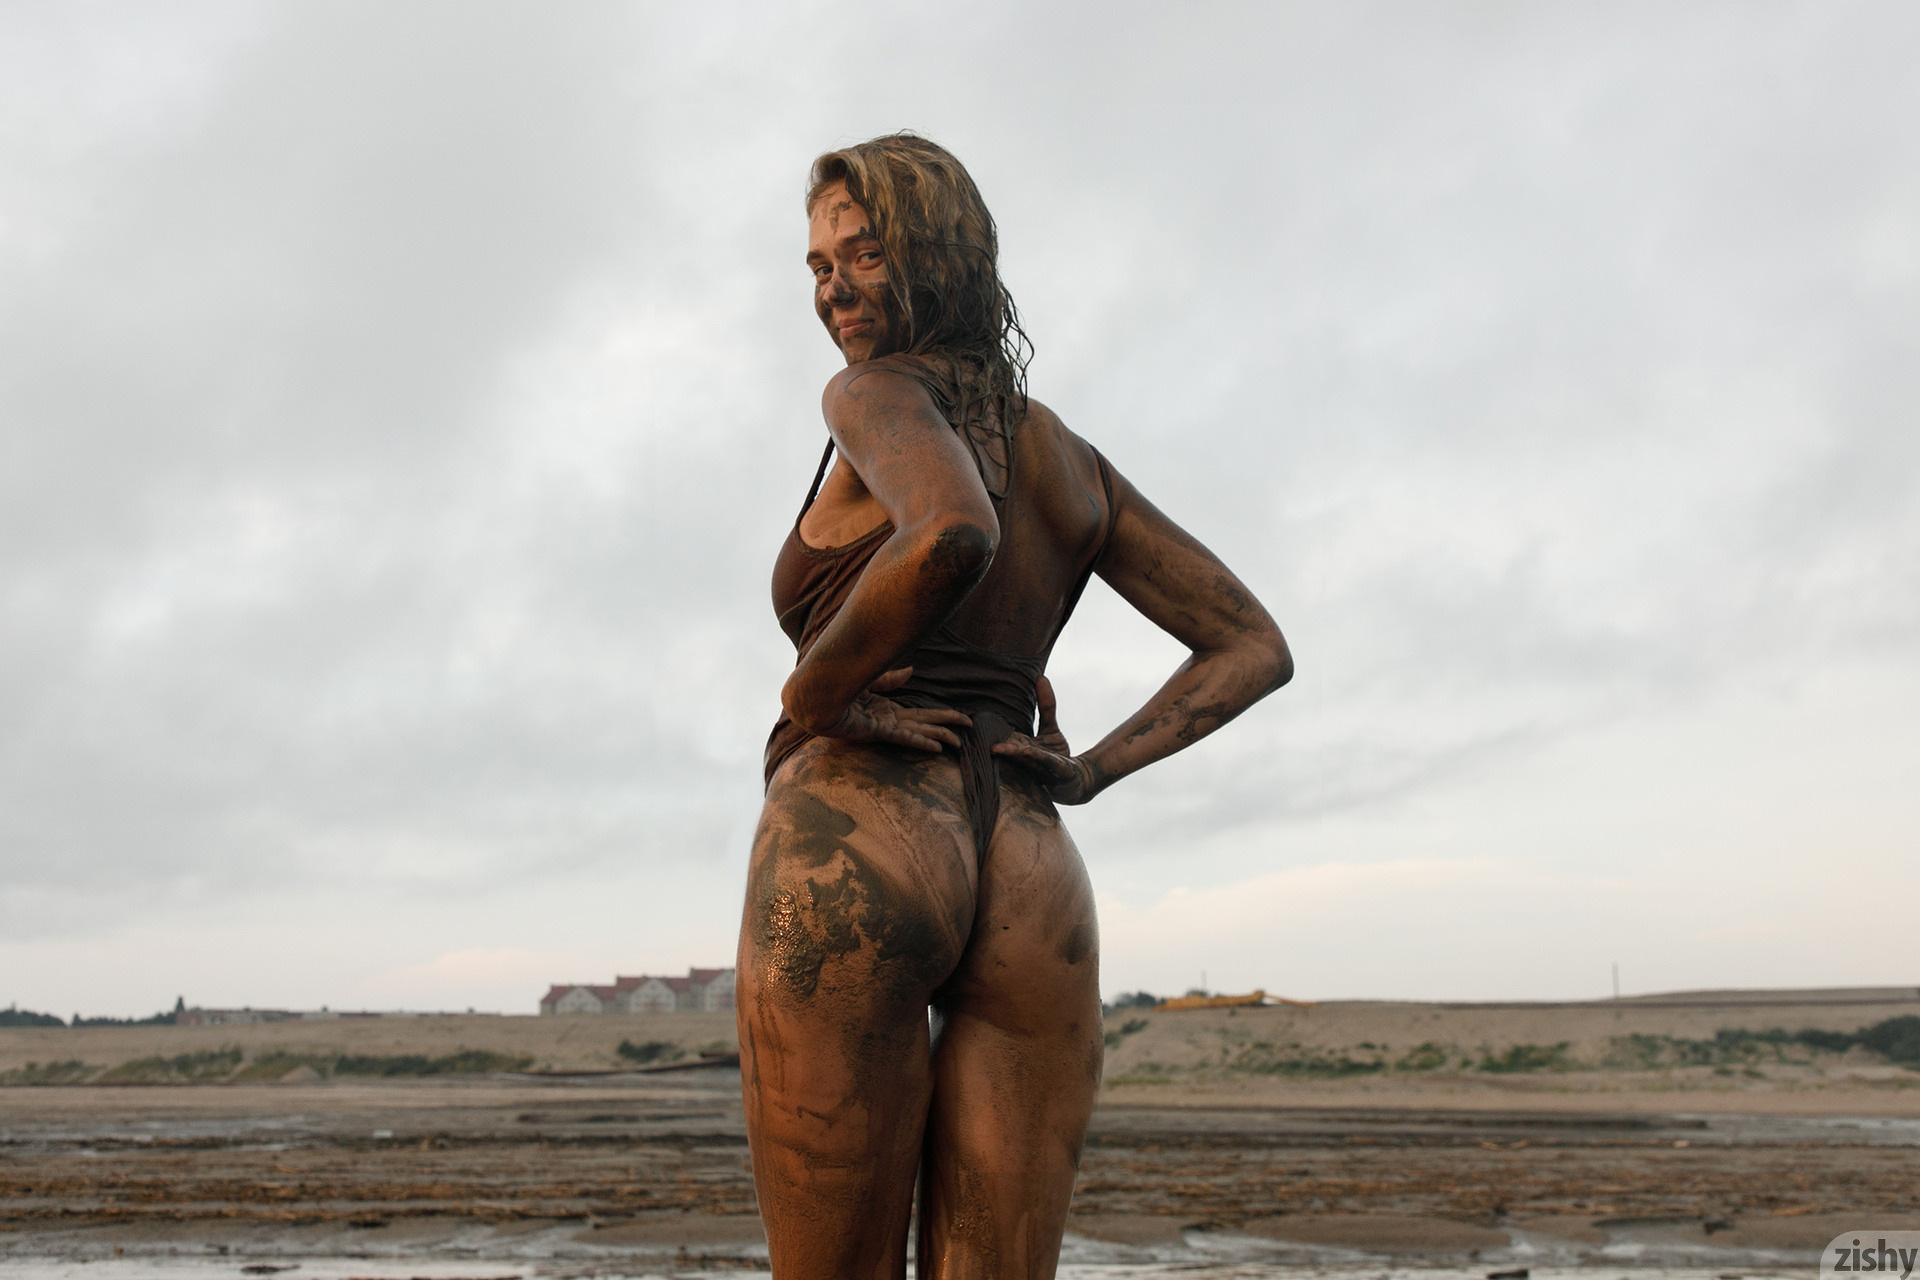 Sofia Orlova On Gryaznyy Beach Zishy (71)